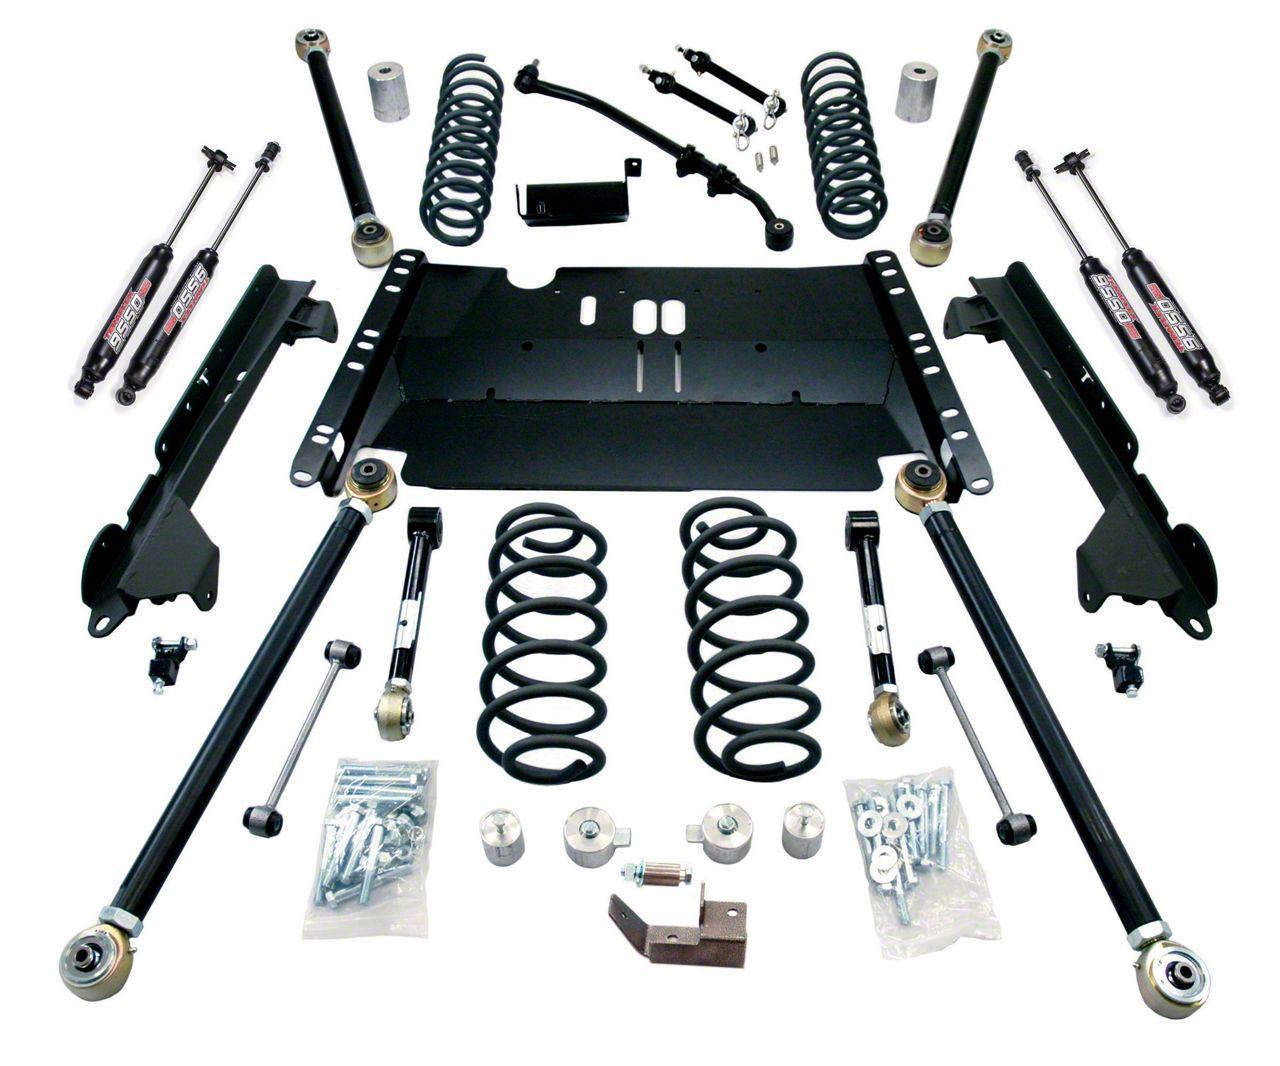 Teraflex 3 in. Enduro LCG Lift Kit w/ 9550 Shocks (97-06 Jeep Wrangler TJ)